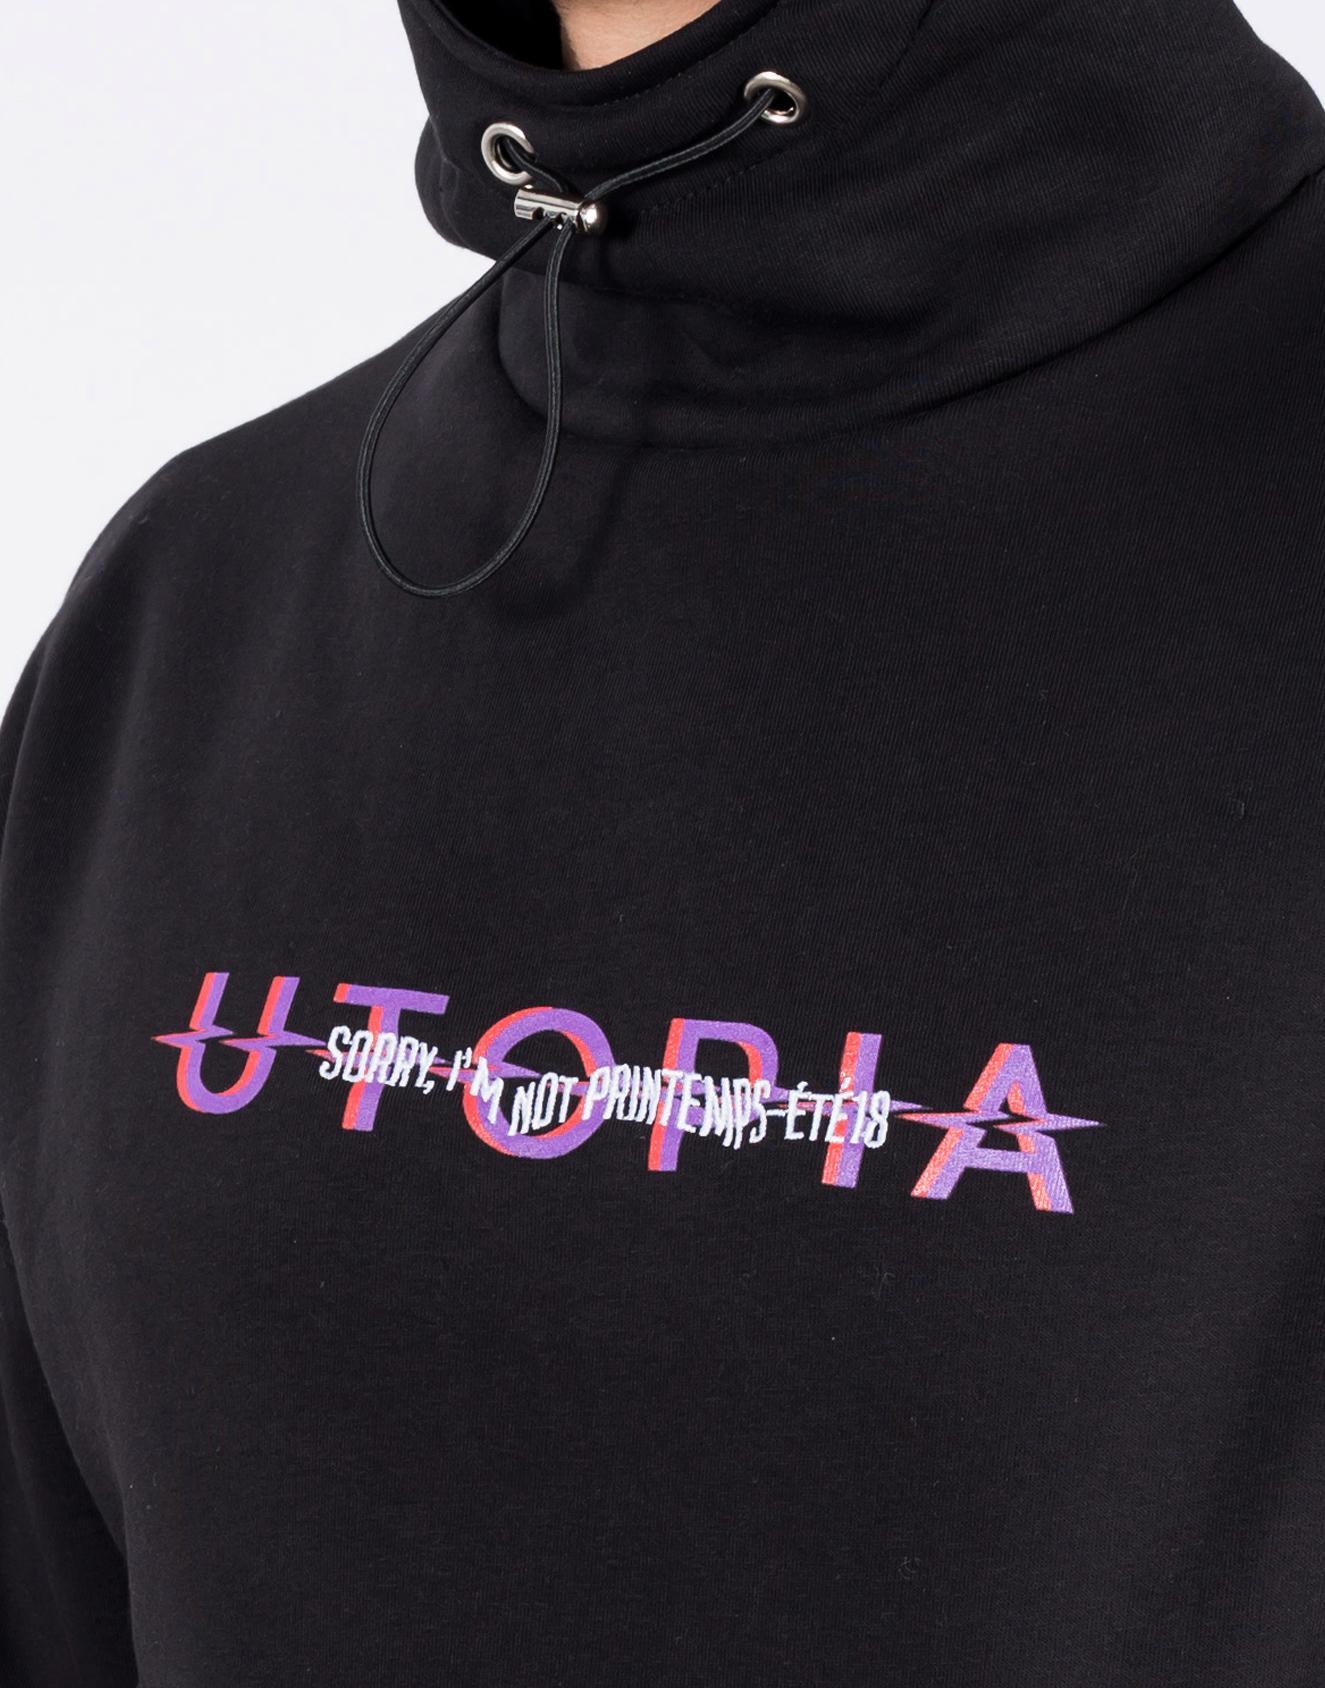 утопия худ м 1